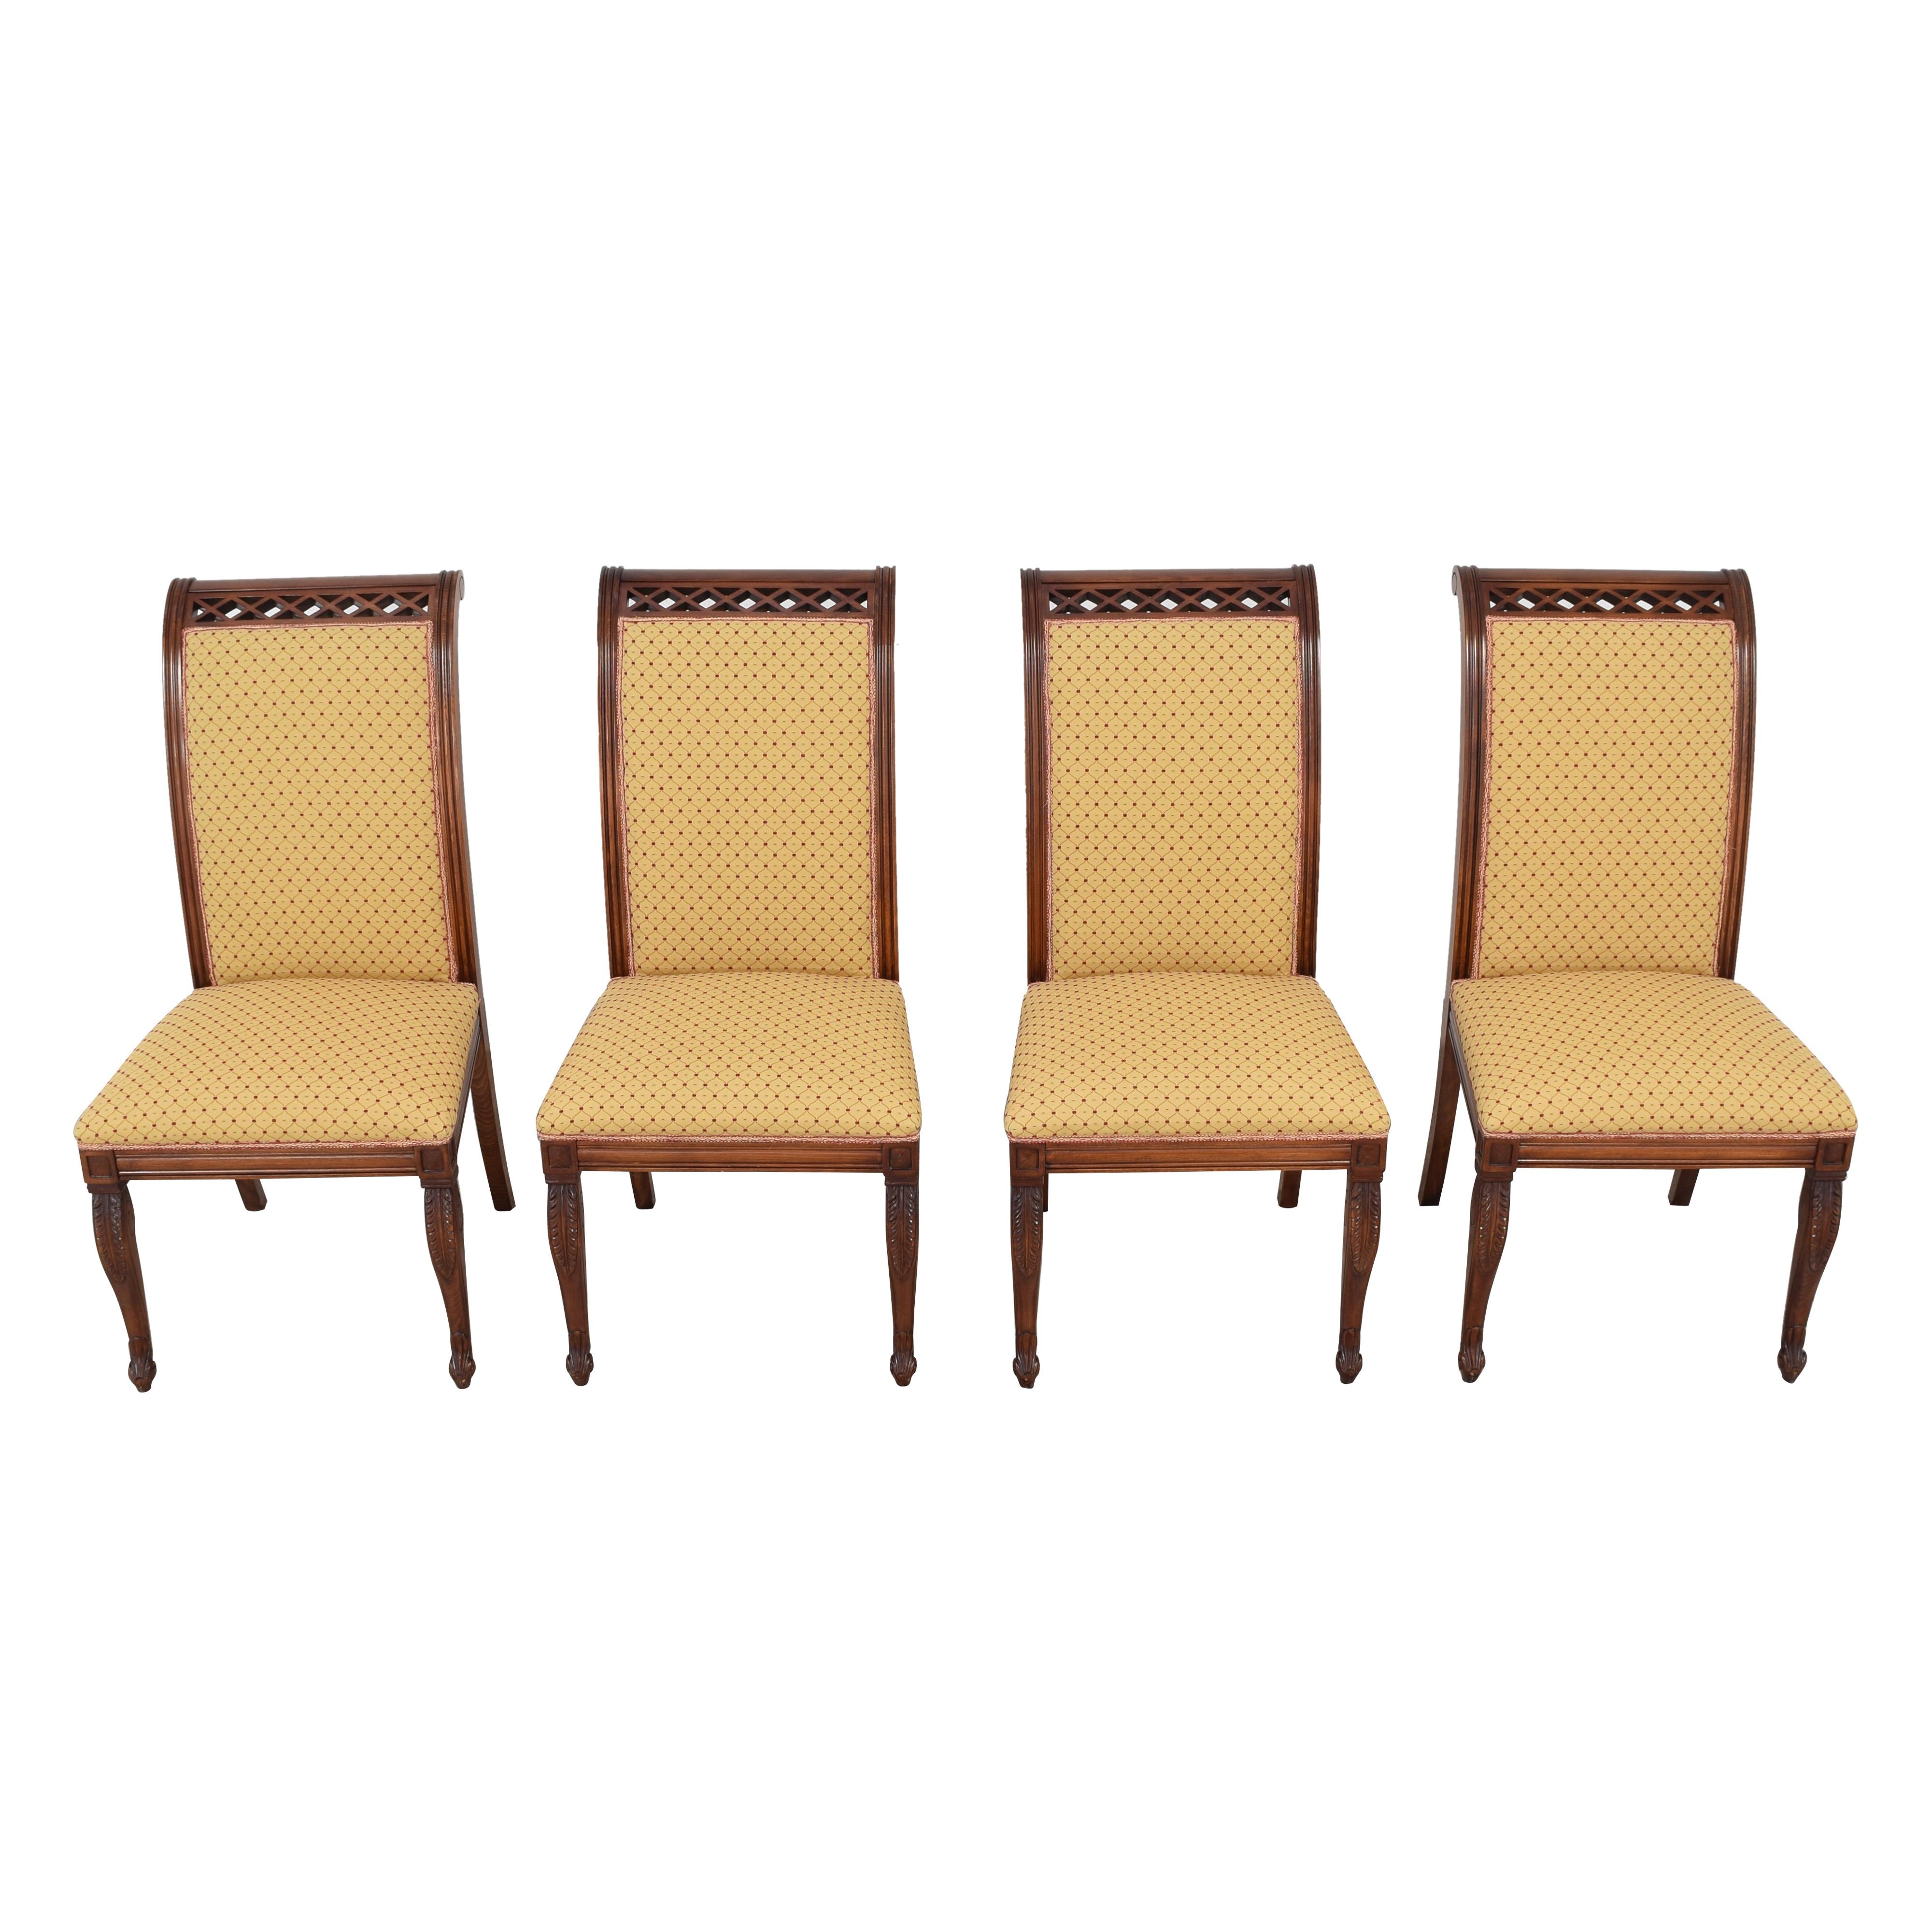 KPS Furnishings KPS Furnishings Custom Dining Chairs second hand